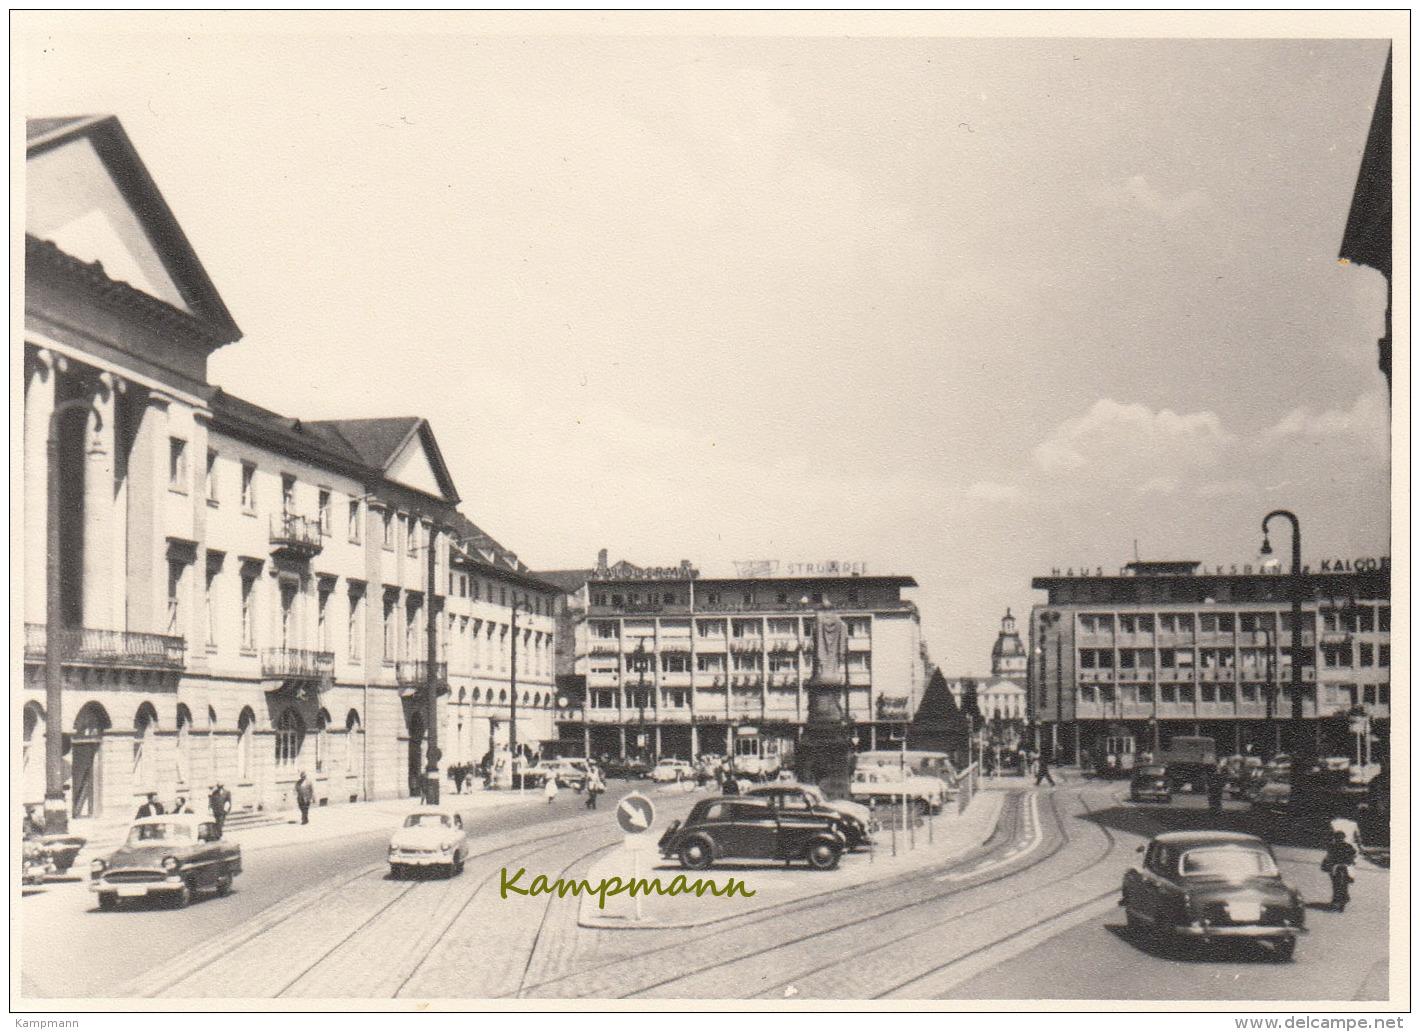 Opel Olympia Rekord,Lloyd,Mercedes 170,Ponton,Tram,Karlsruhe,Probeabzug,ungelaufen - Passenger Cars